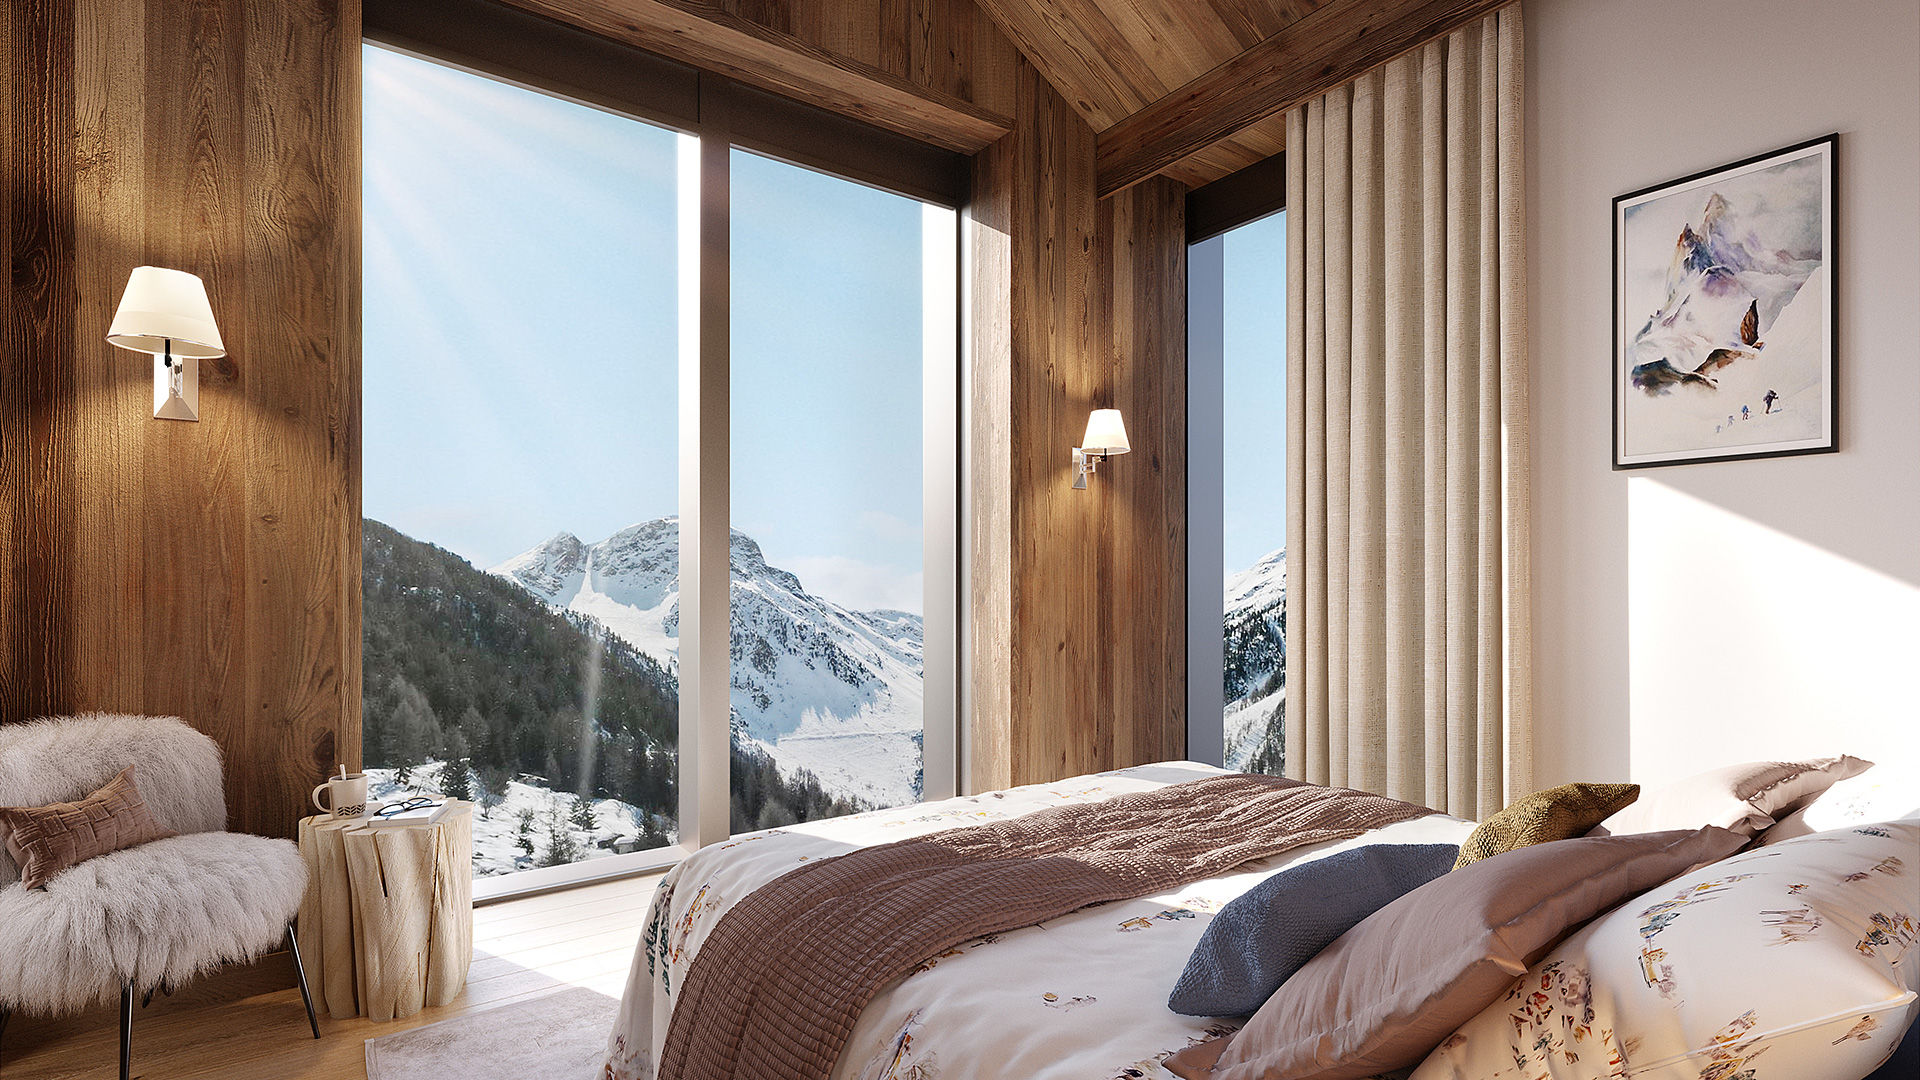 Guerneres Chalets Chalet, Switzerland